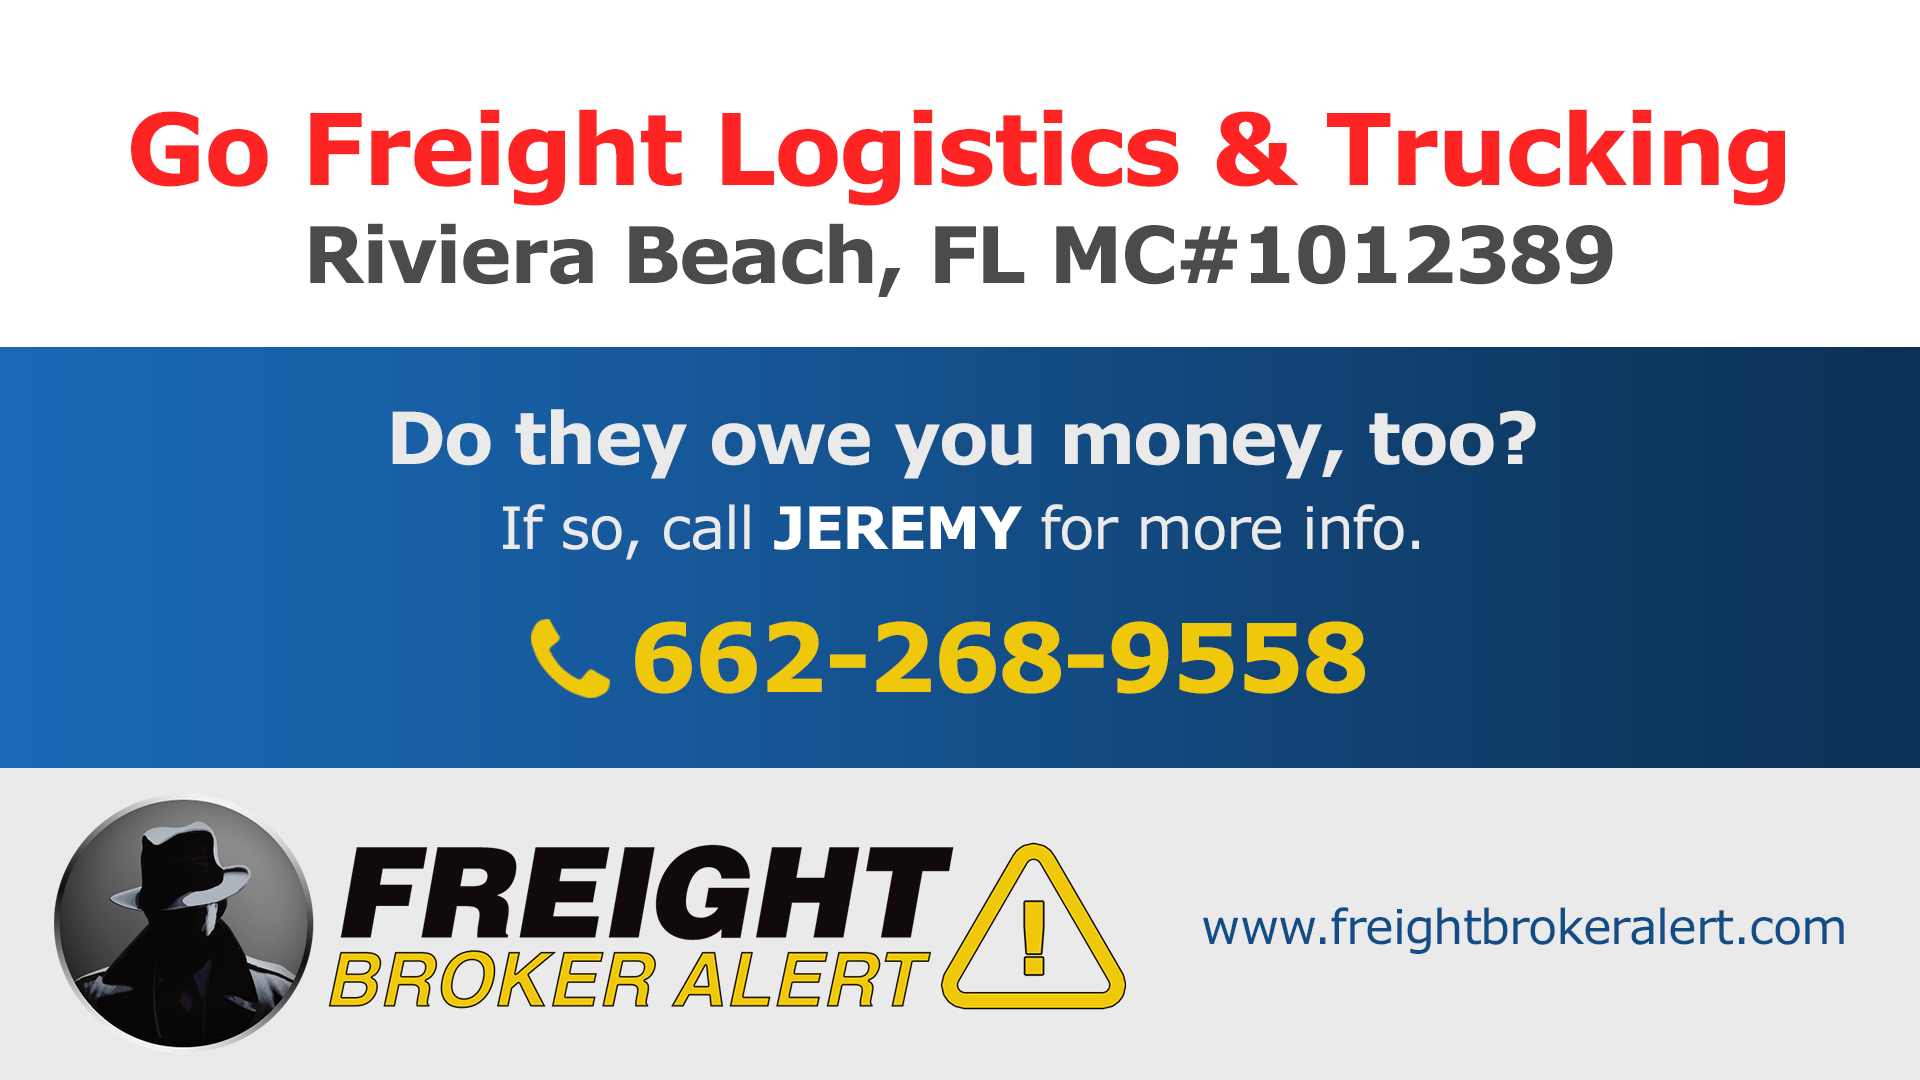 Go Freight Logistics & Trucking LLC Florida